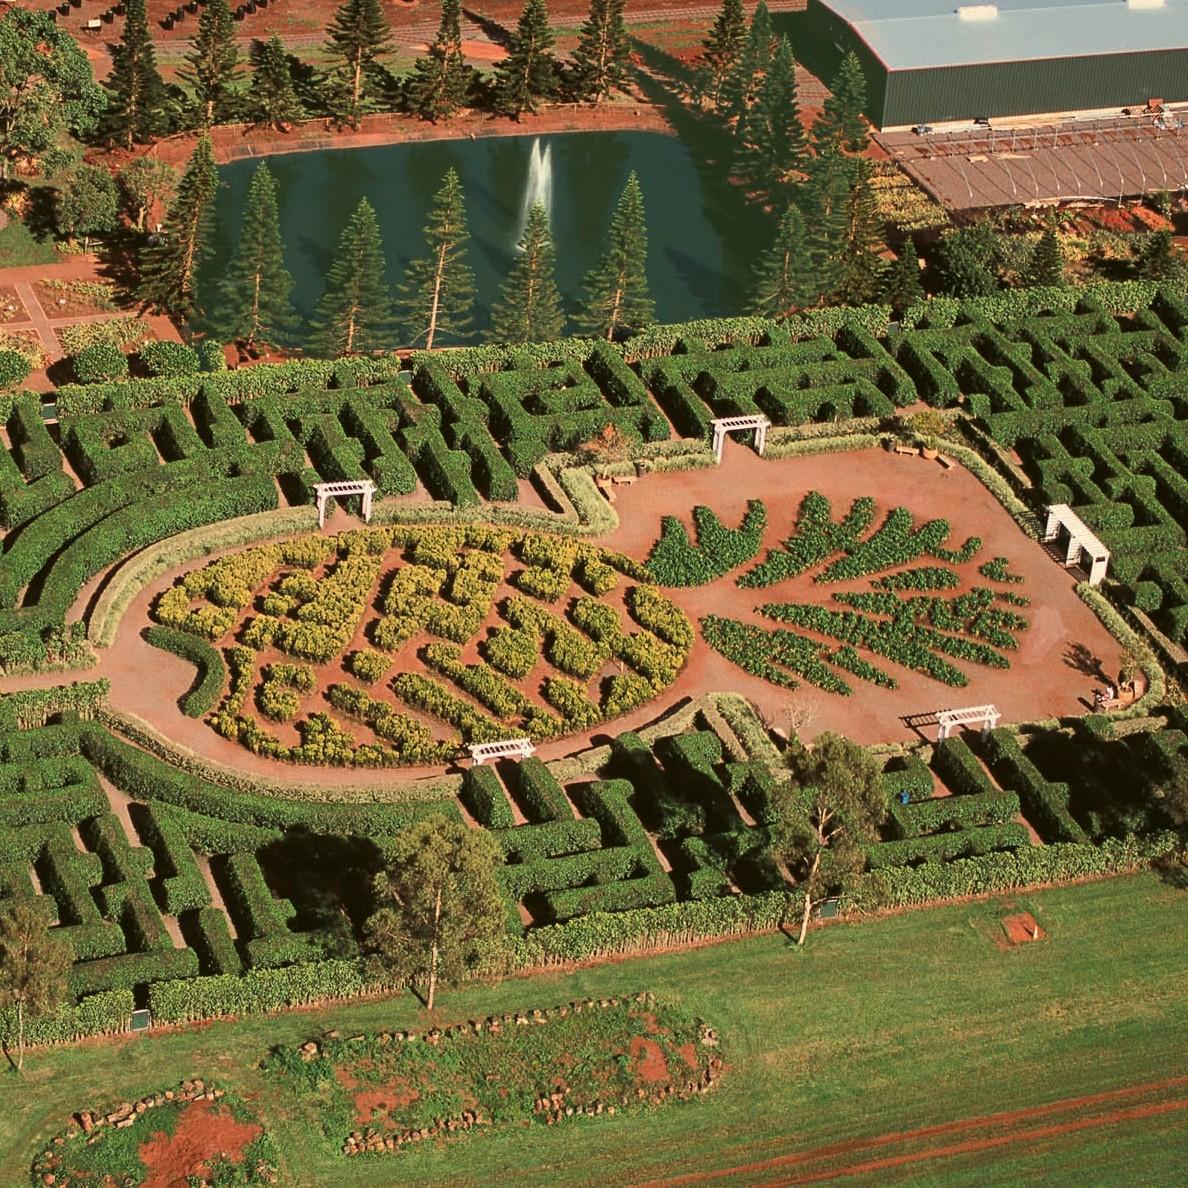 Dole Plantation: The Maze